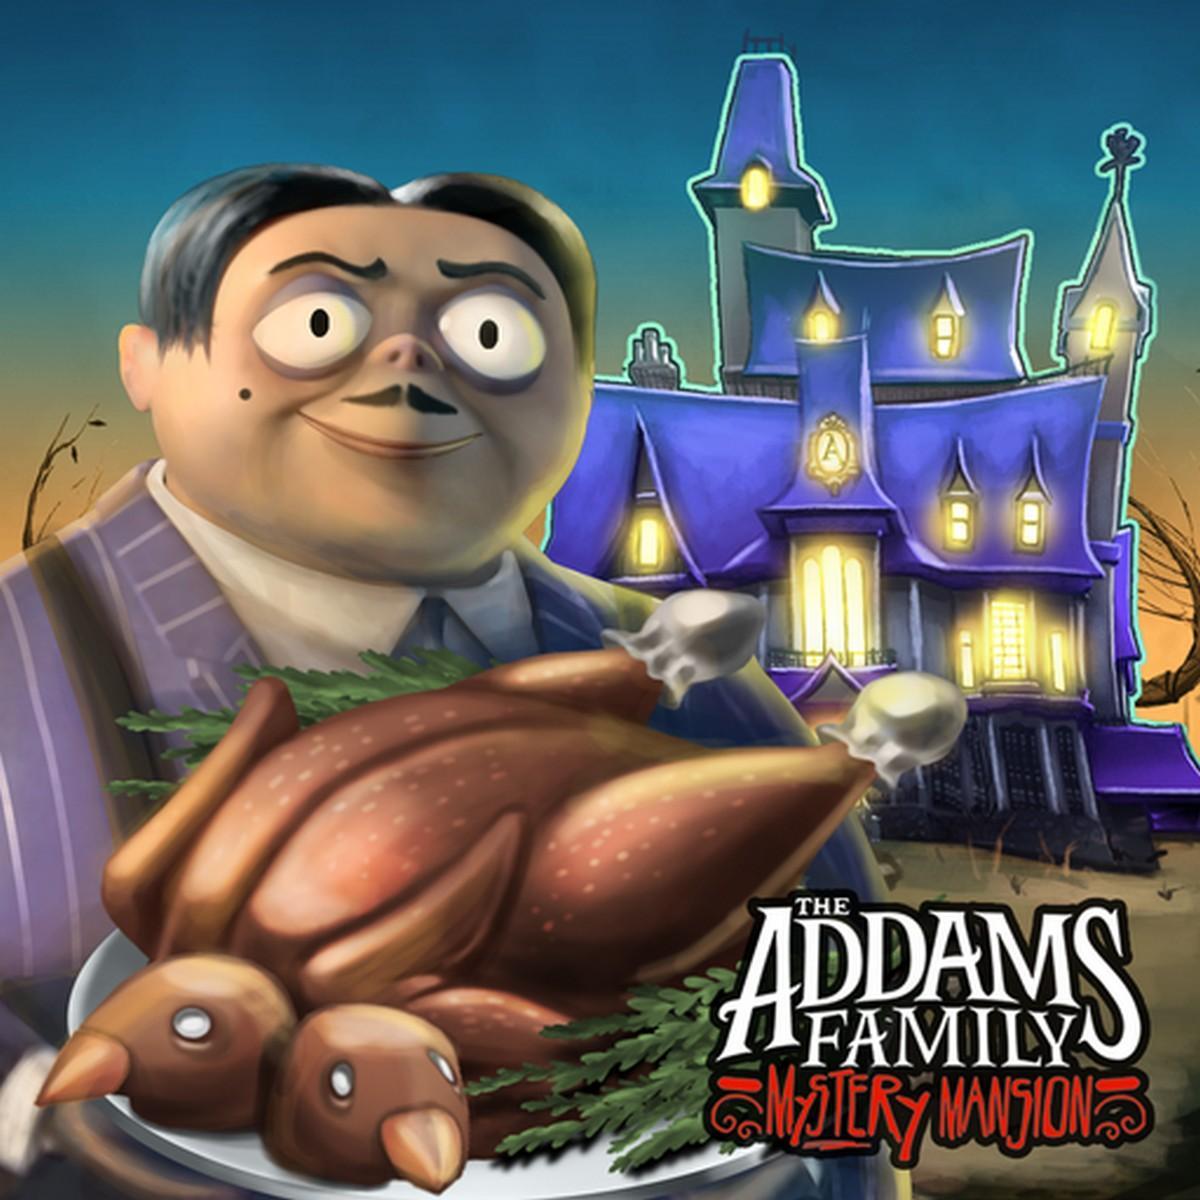 Addams Family Mystery Mansion APK MOD